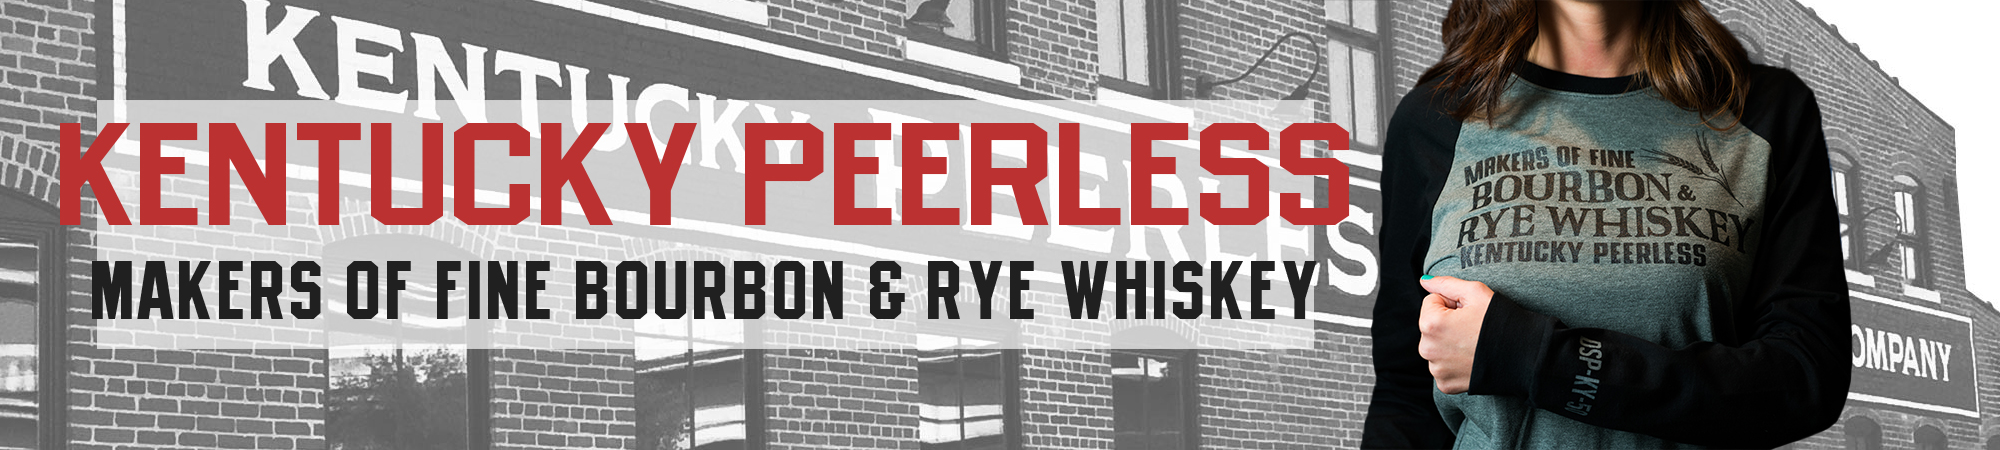 Makers of Fine Bourbon & Moonshine